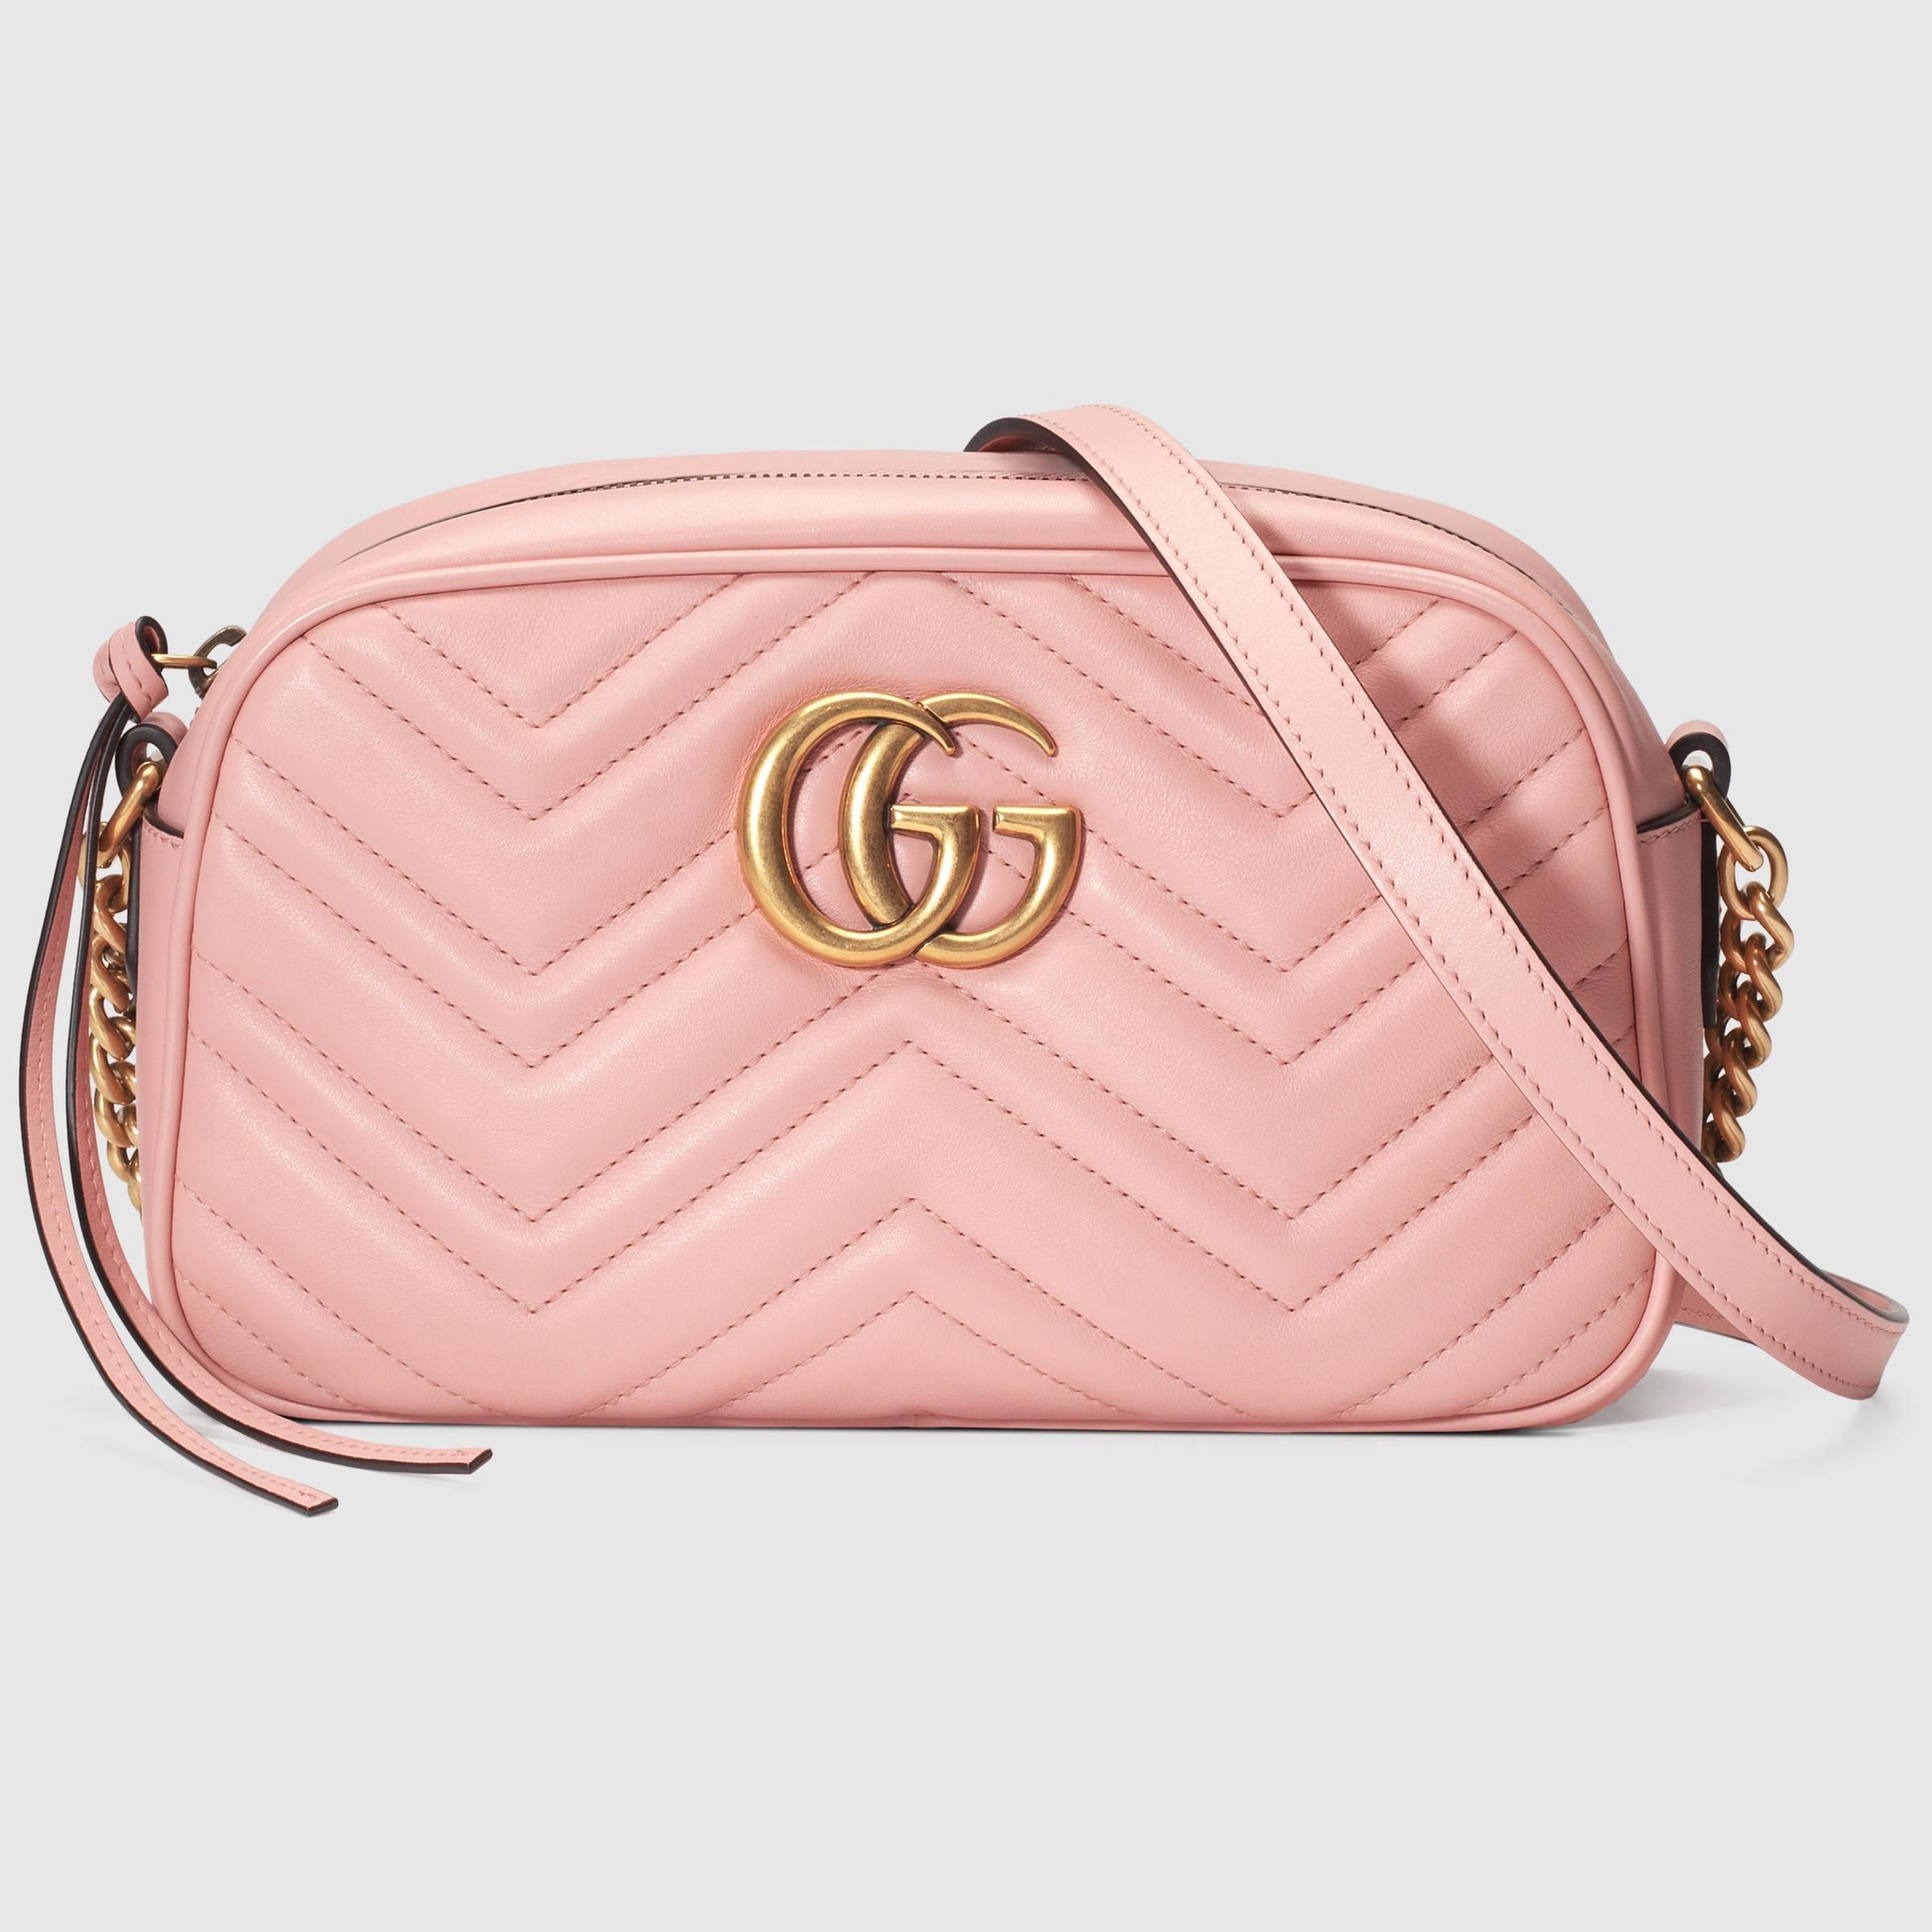 Lyst - Gucci GG Marmont Matelassé Leather Shoulder Bag in ...